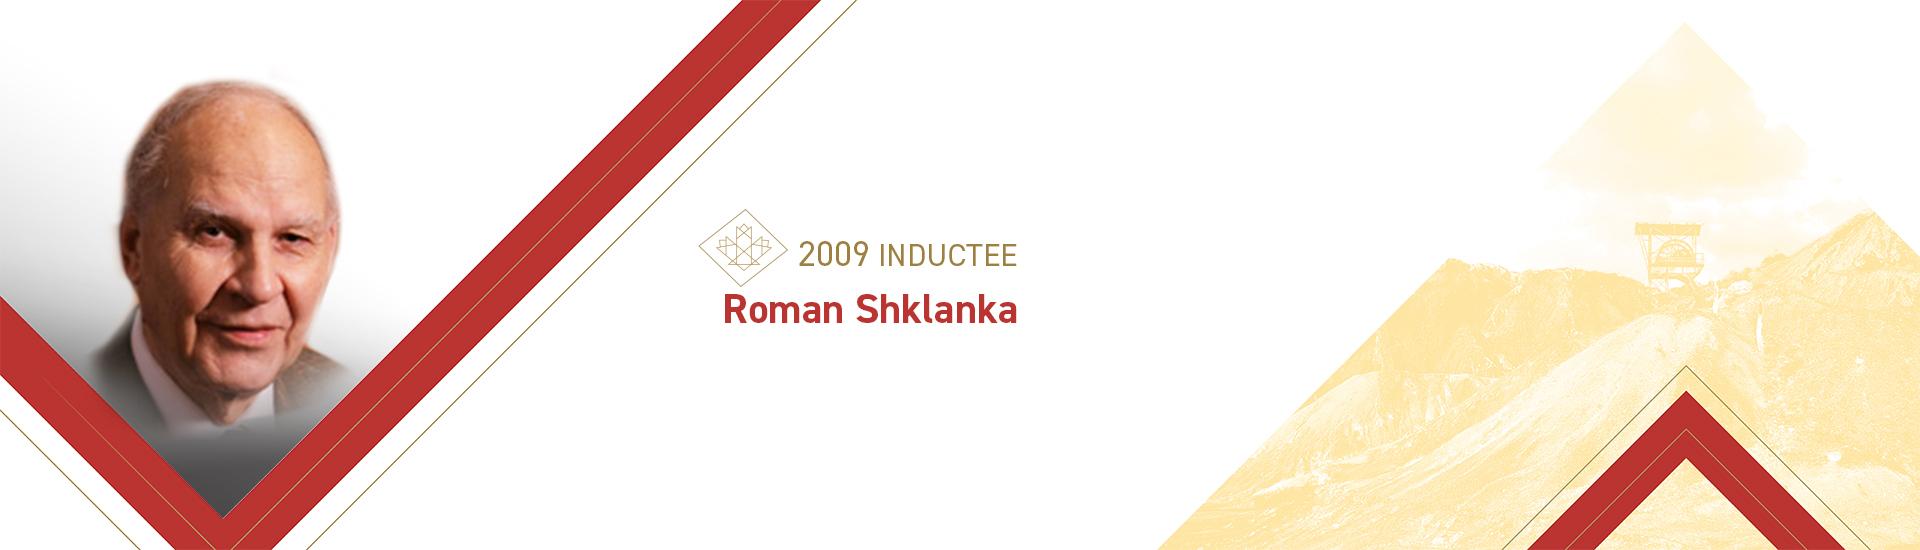 Roman Shklanka (b. 1932)